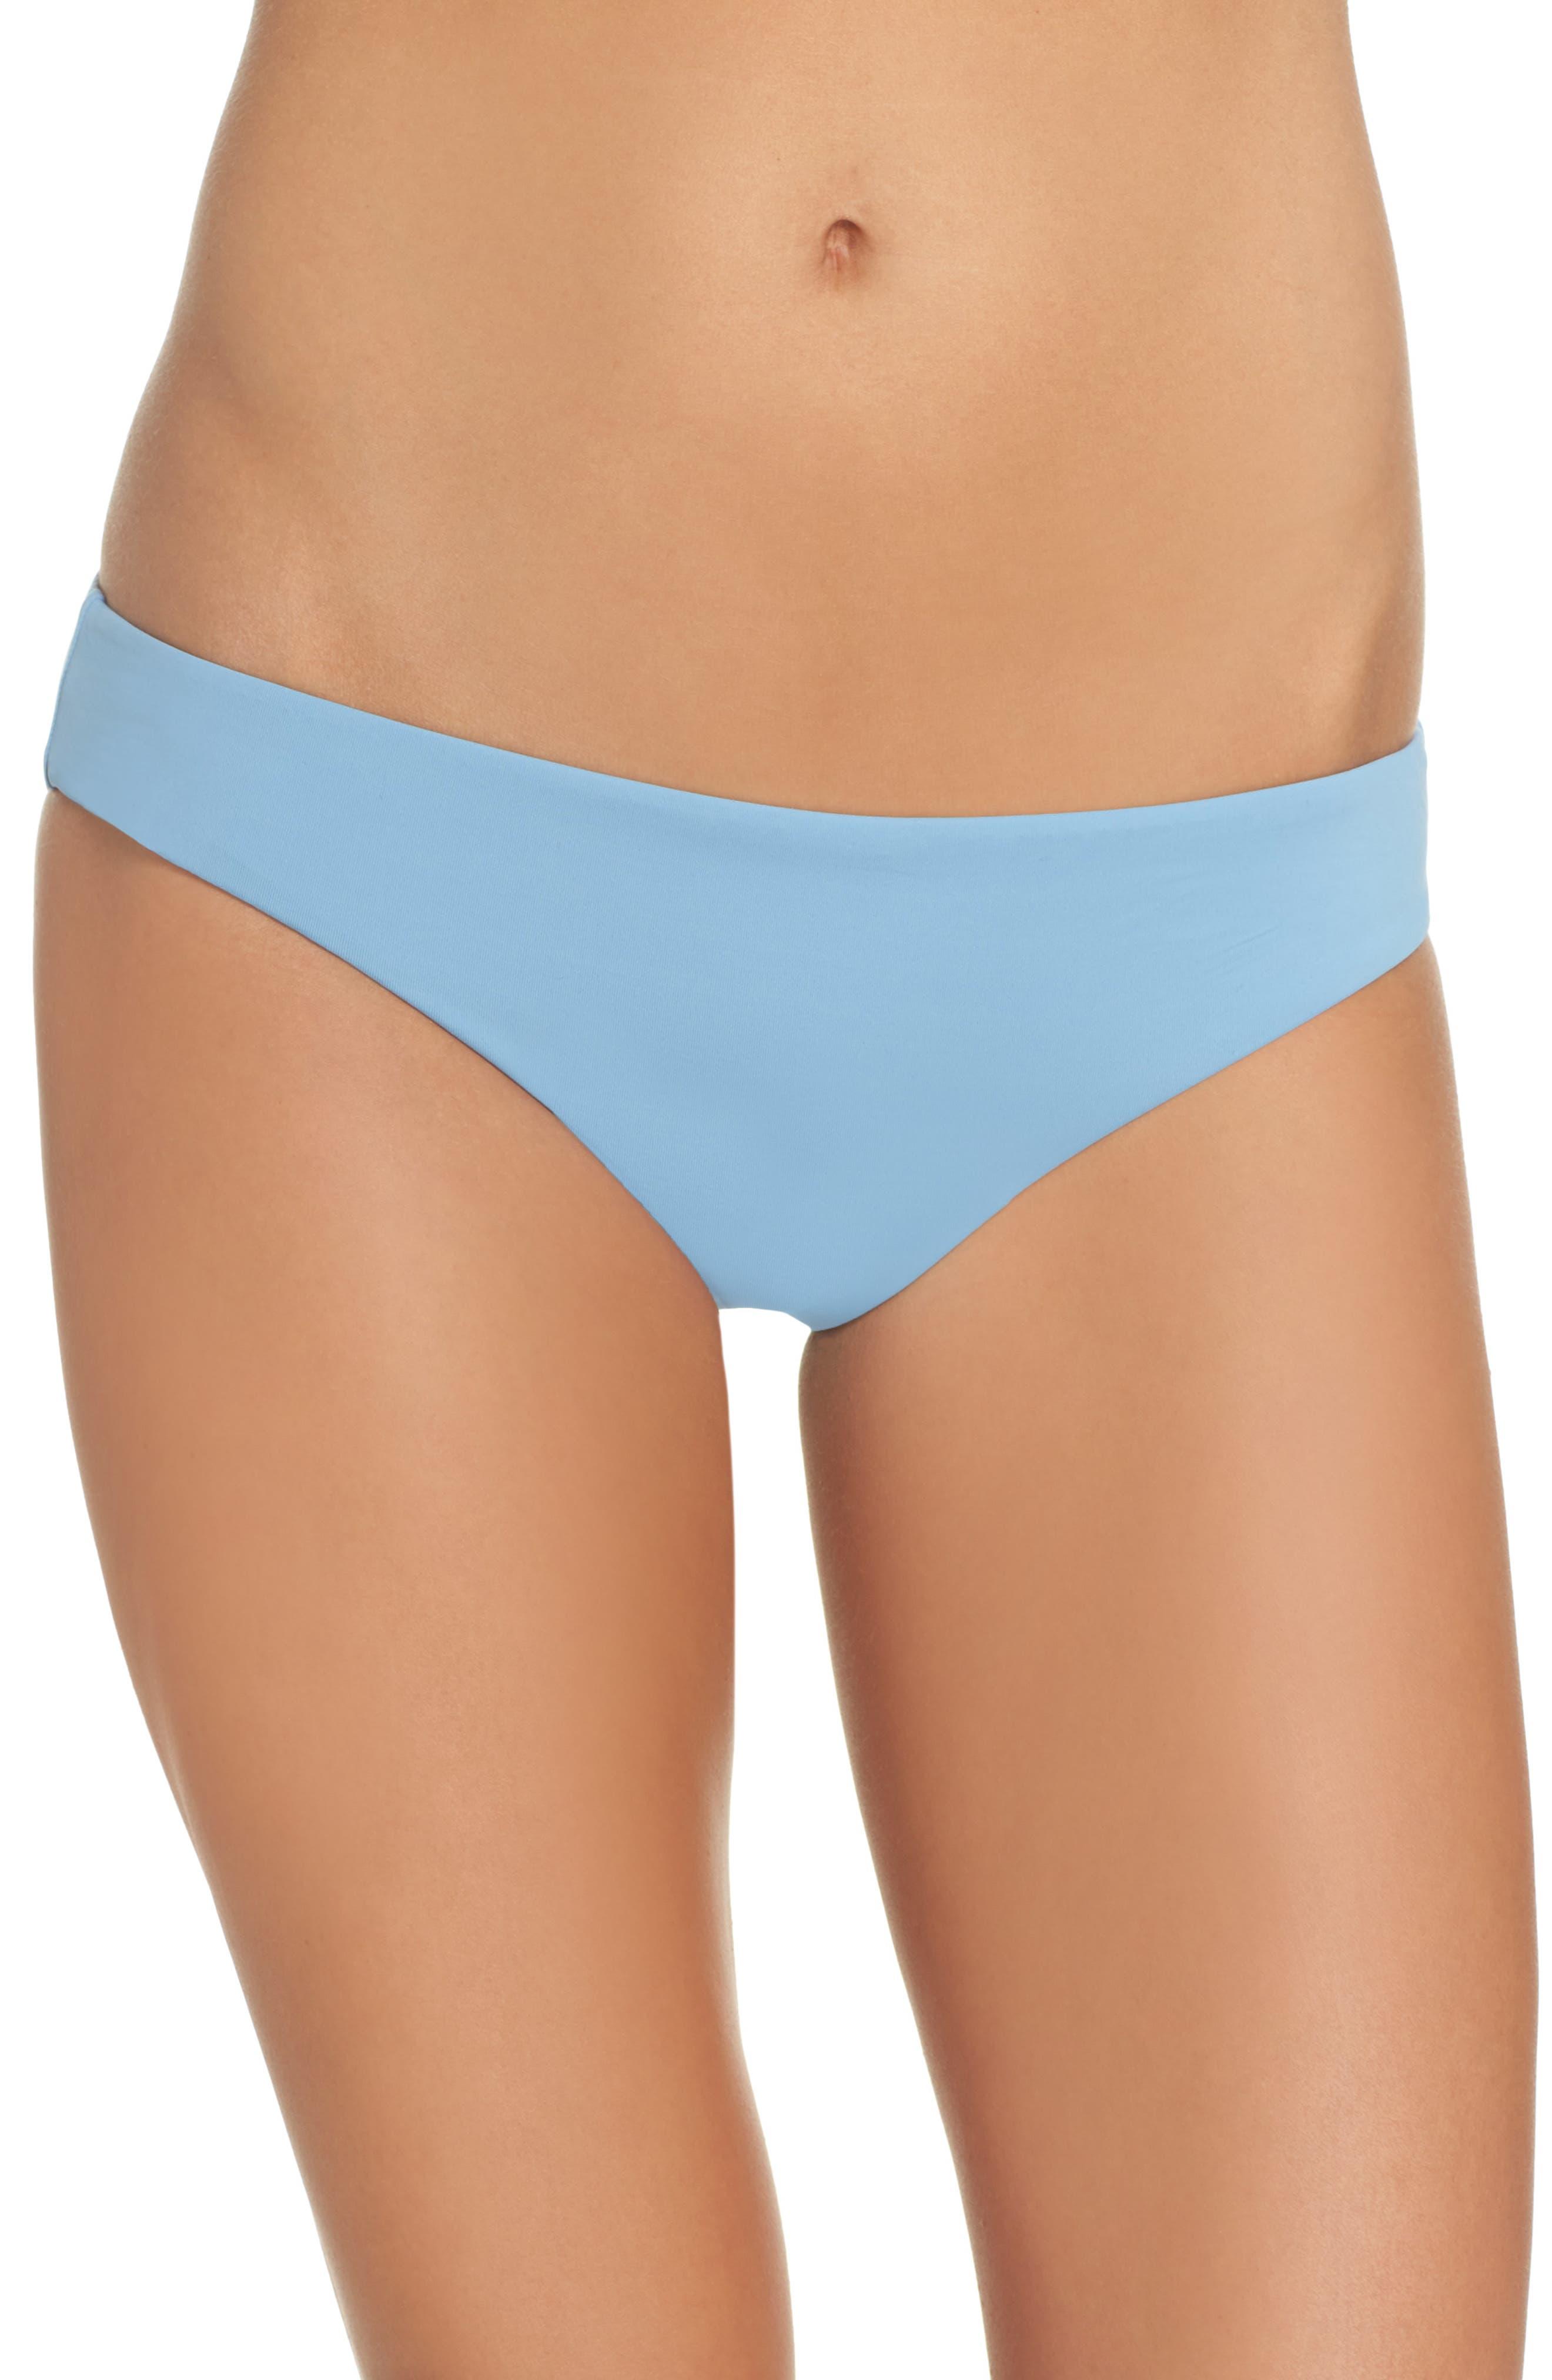 Active Bikini Bottoms,                             Main thumbnail 1, color,                             Blue Mist